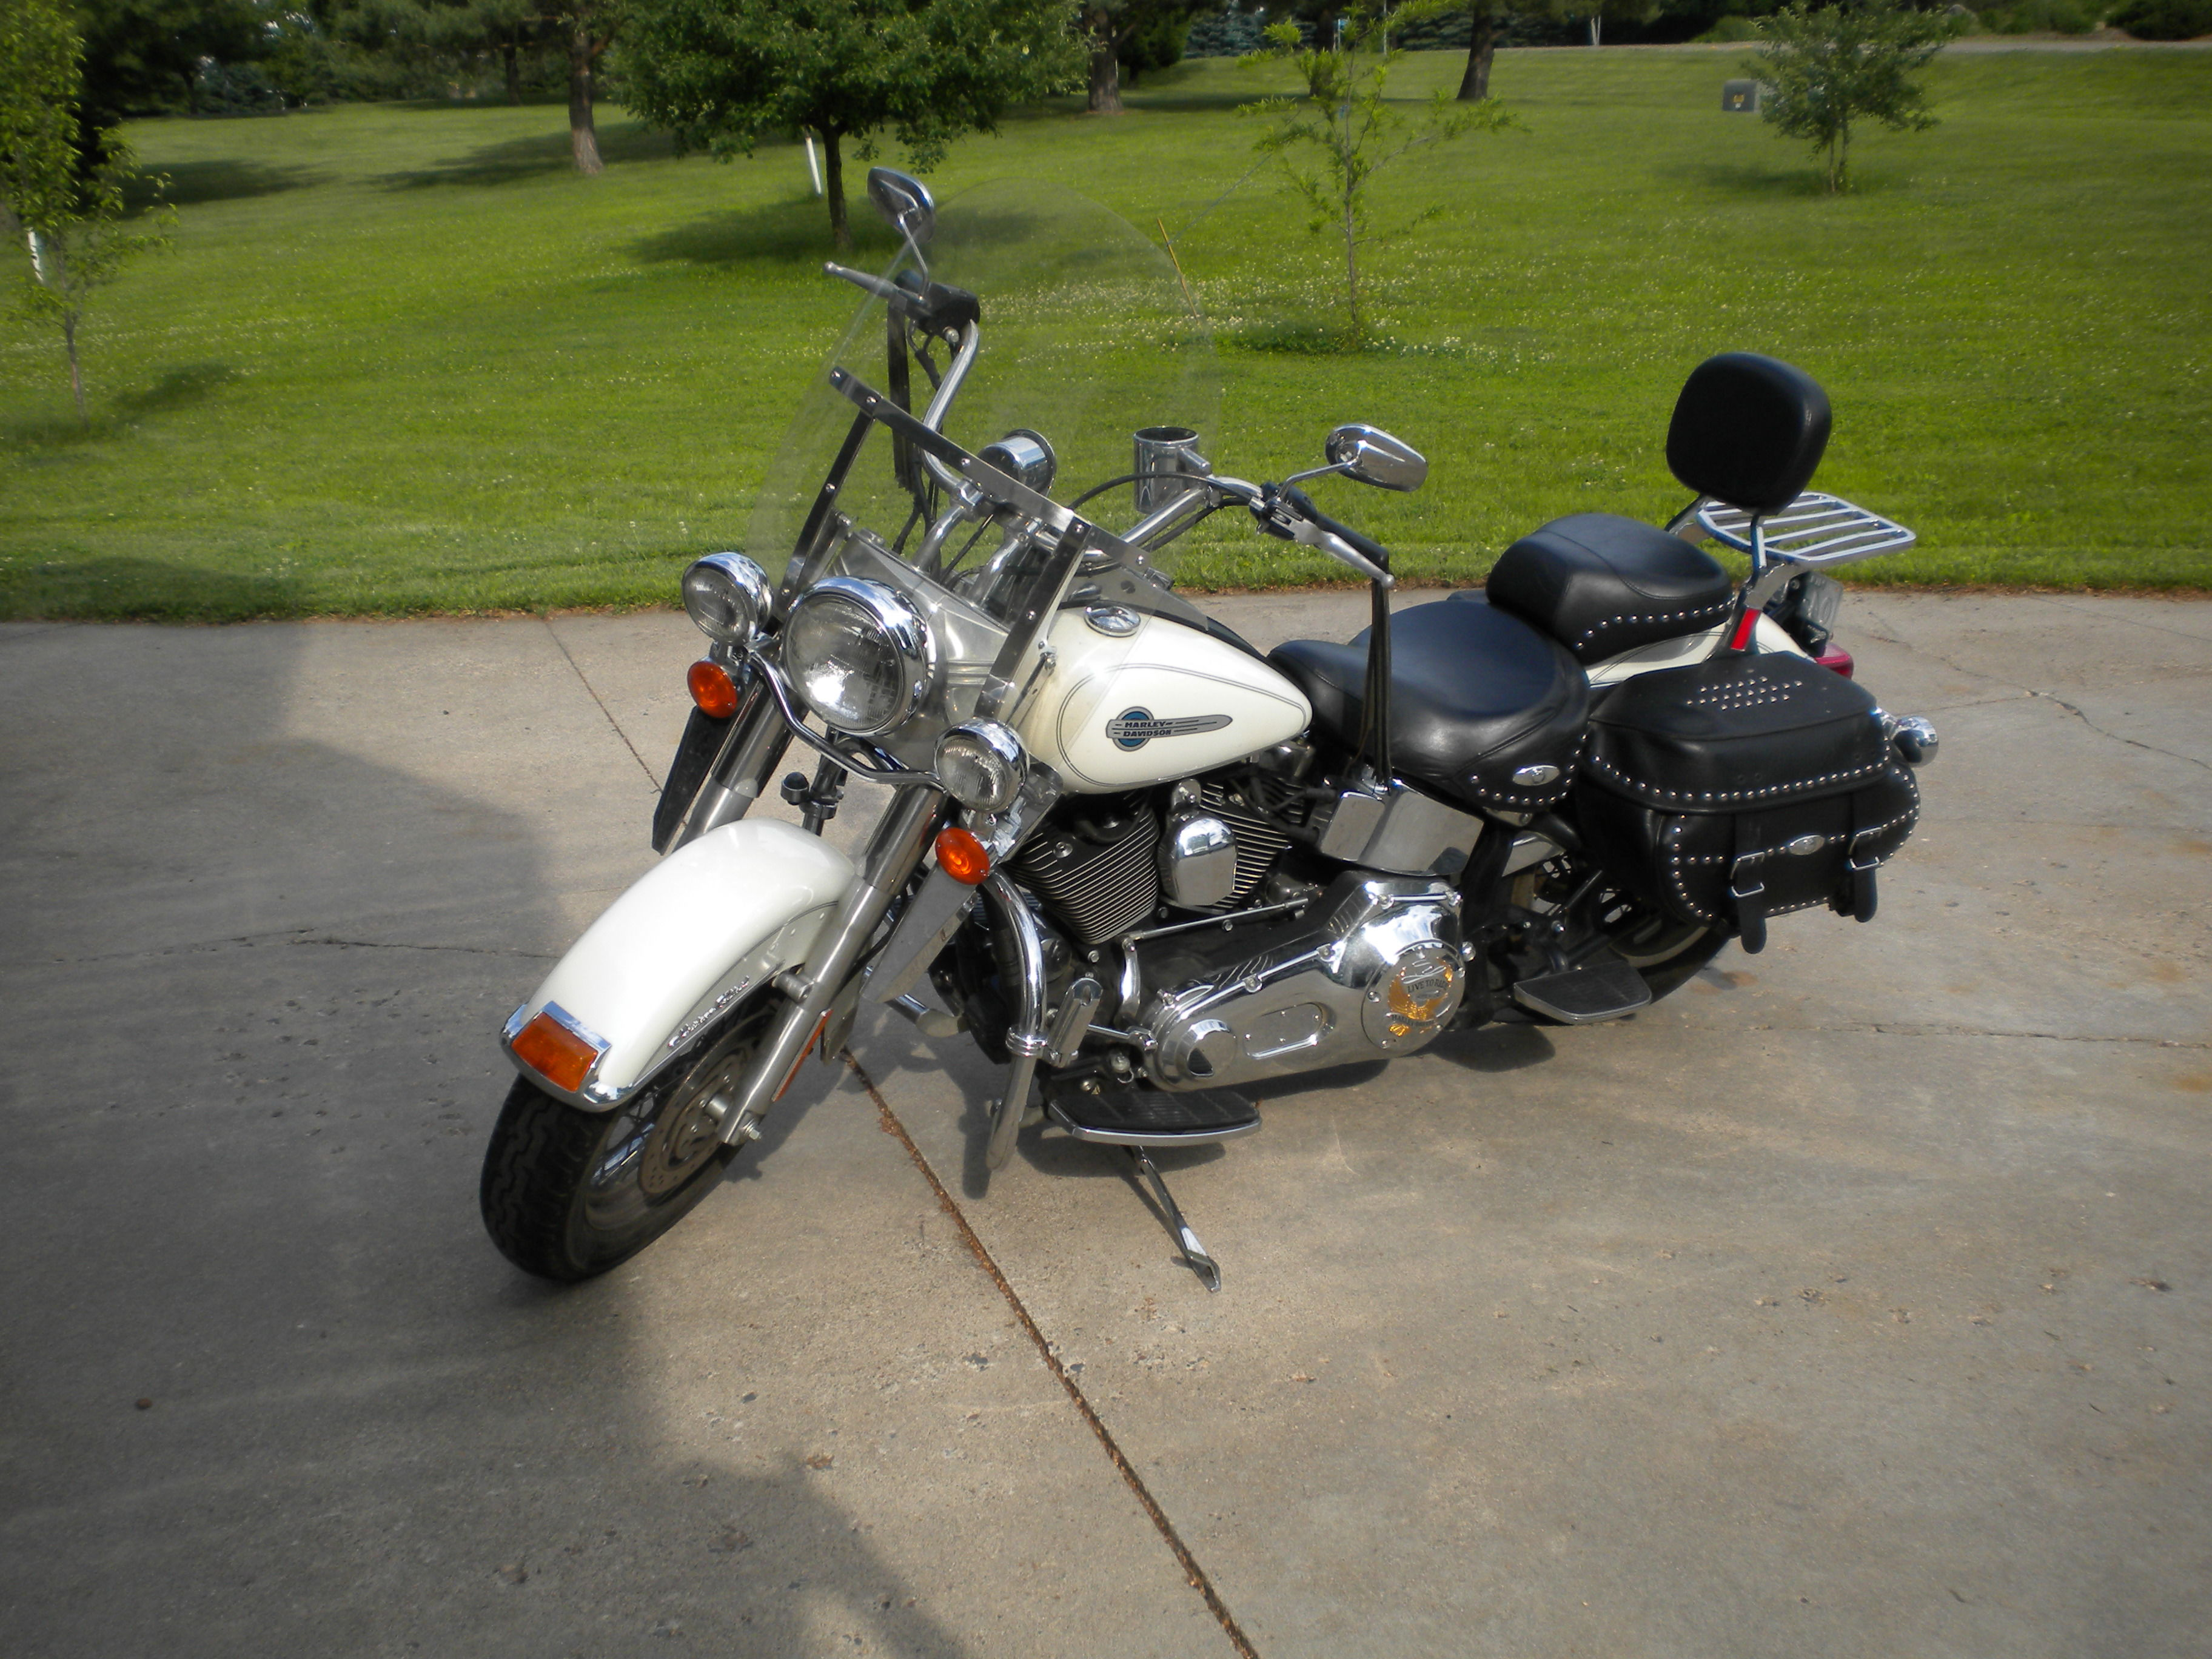 2004 Harley Davidson Heritage Softail Classic image 1